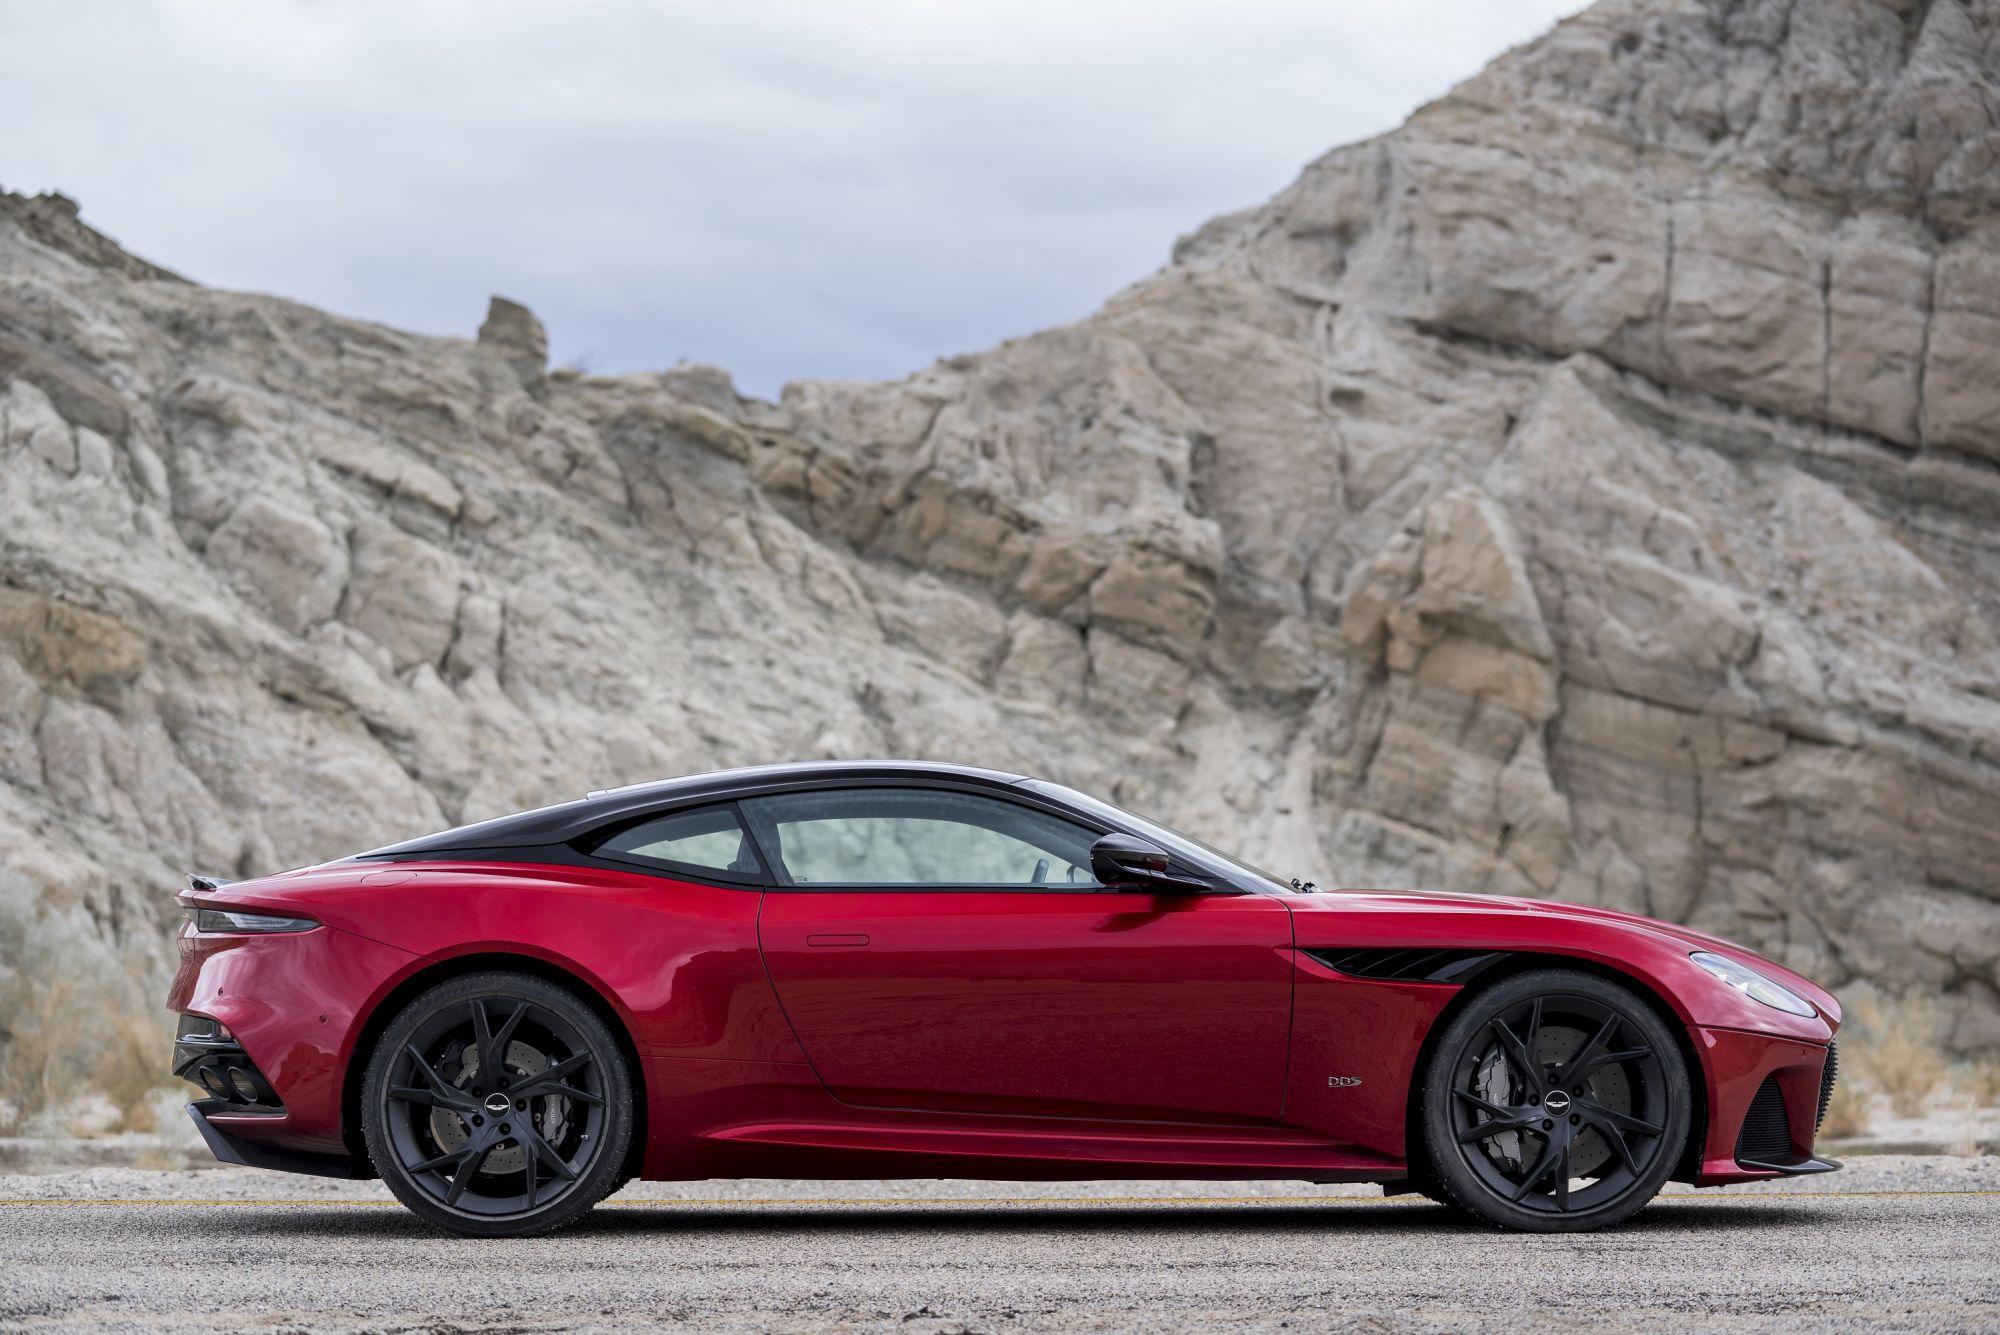 The Aston Martin Dbs Superleggera Launches In Hong Kong Tatler Hong Kong